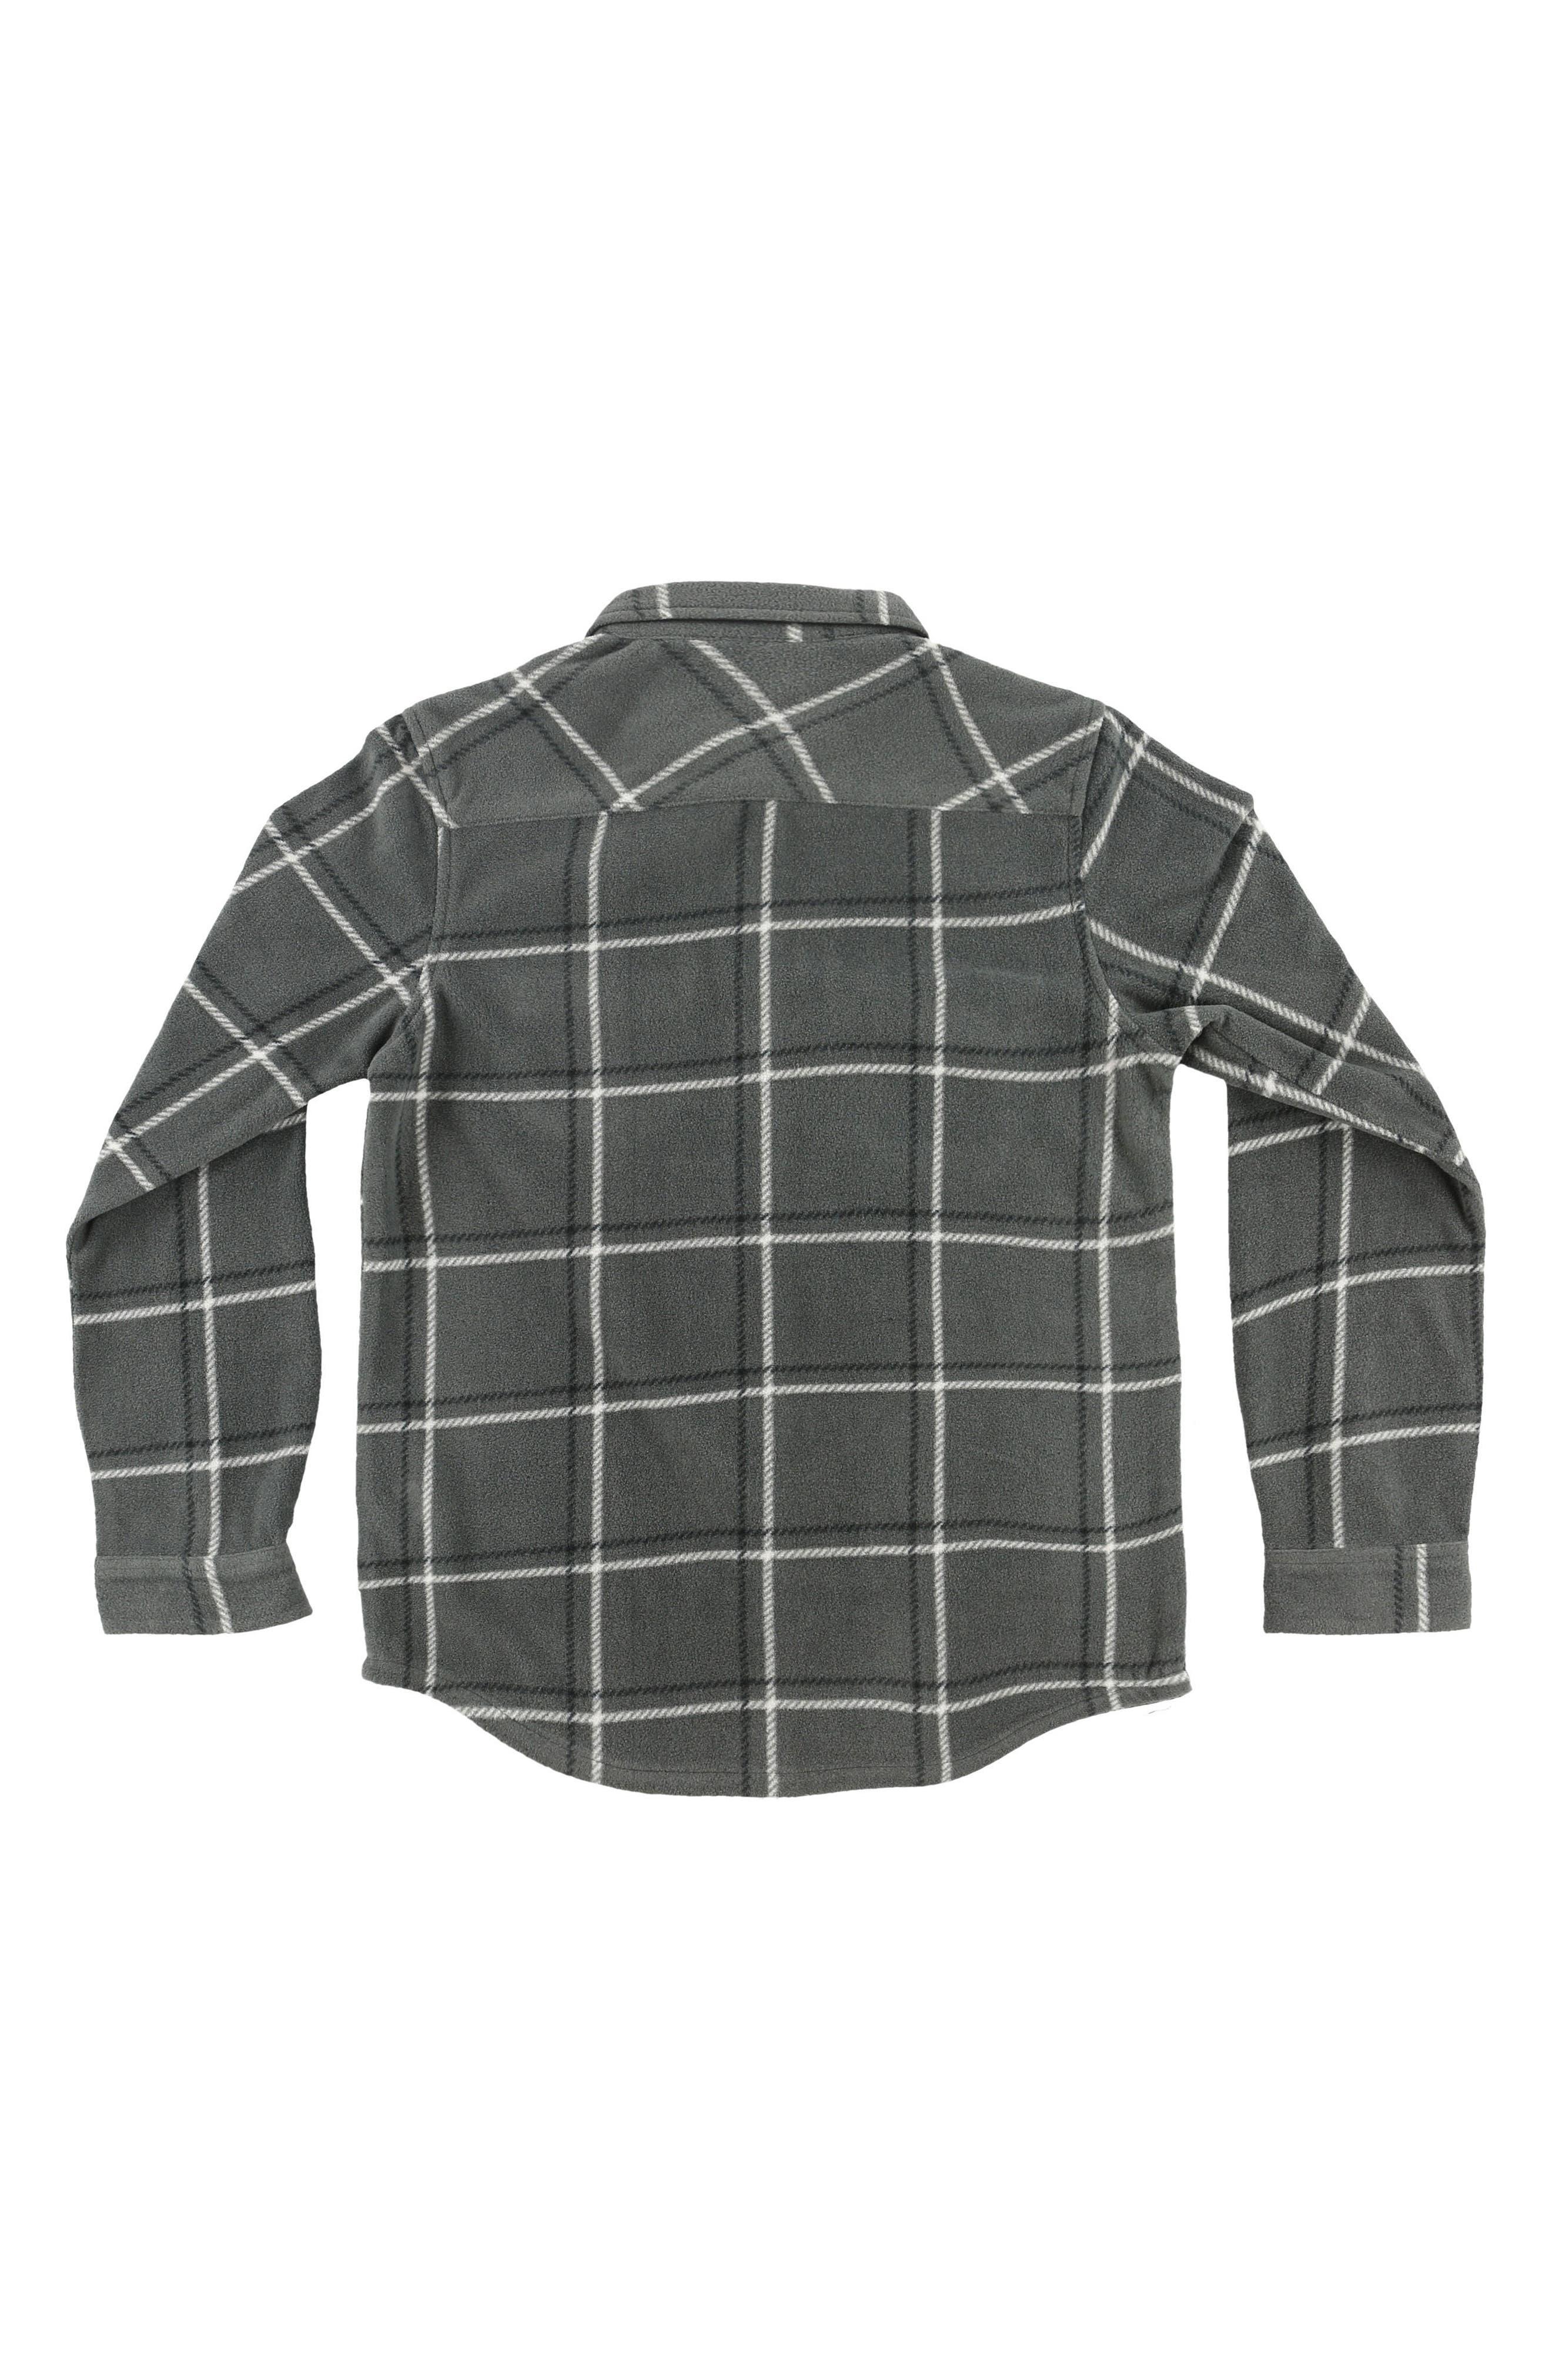 Alternate Image 2  - O'Neill Glacier Series Two Plush Windowpane Shirt (Toddler Boys)